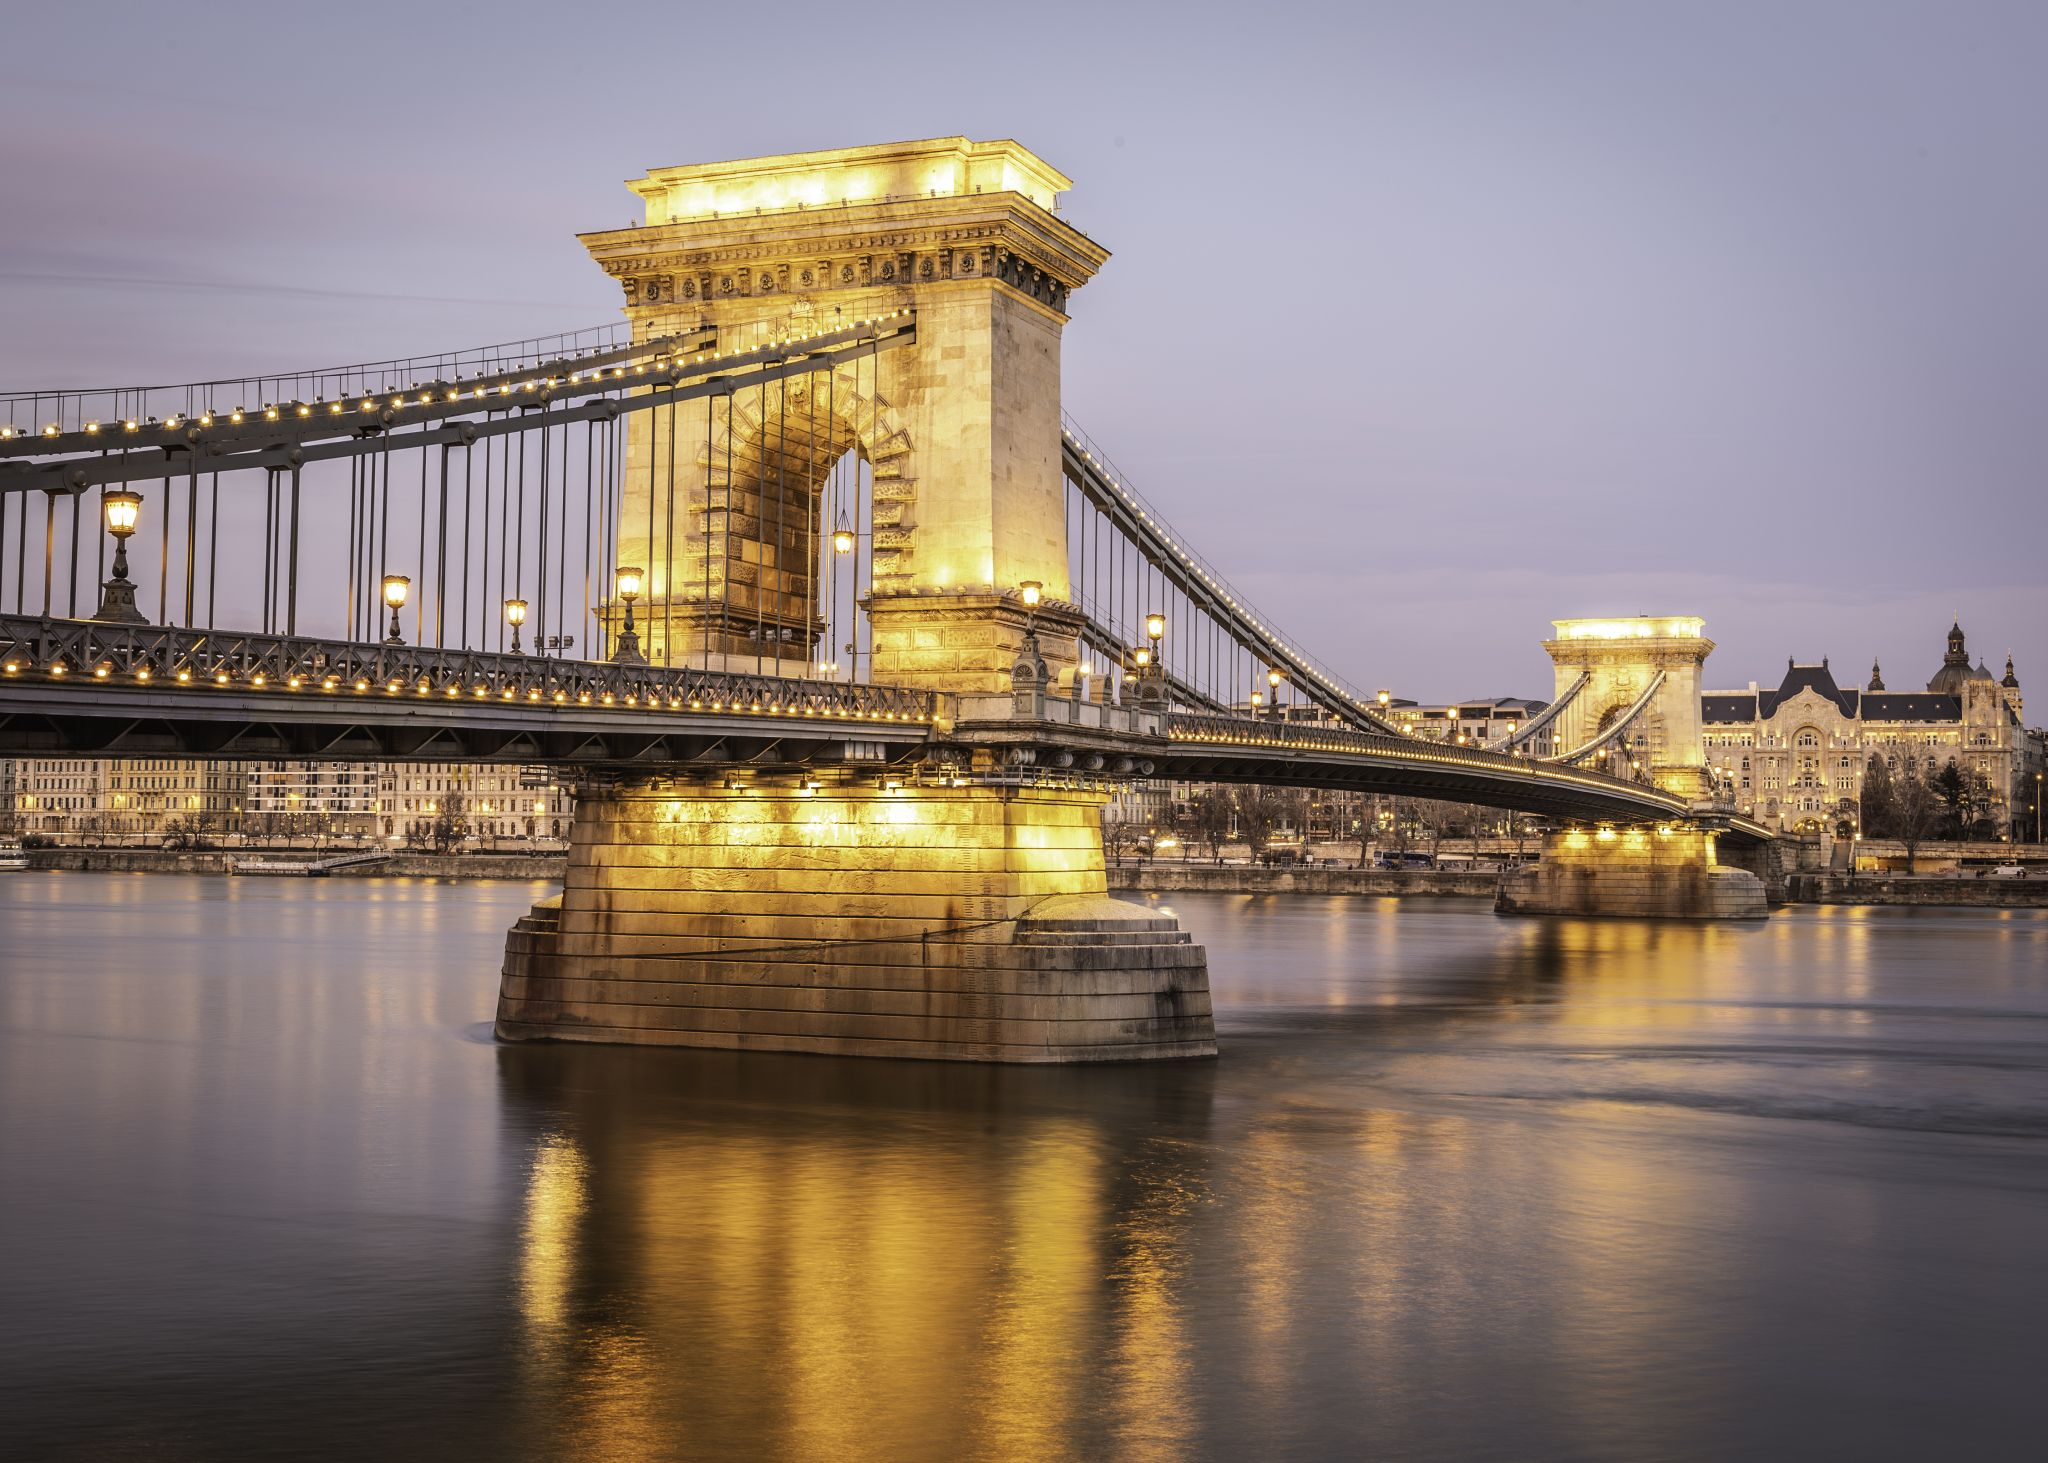 Szechenyi Bridge, Hungary